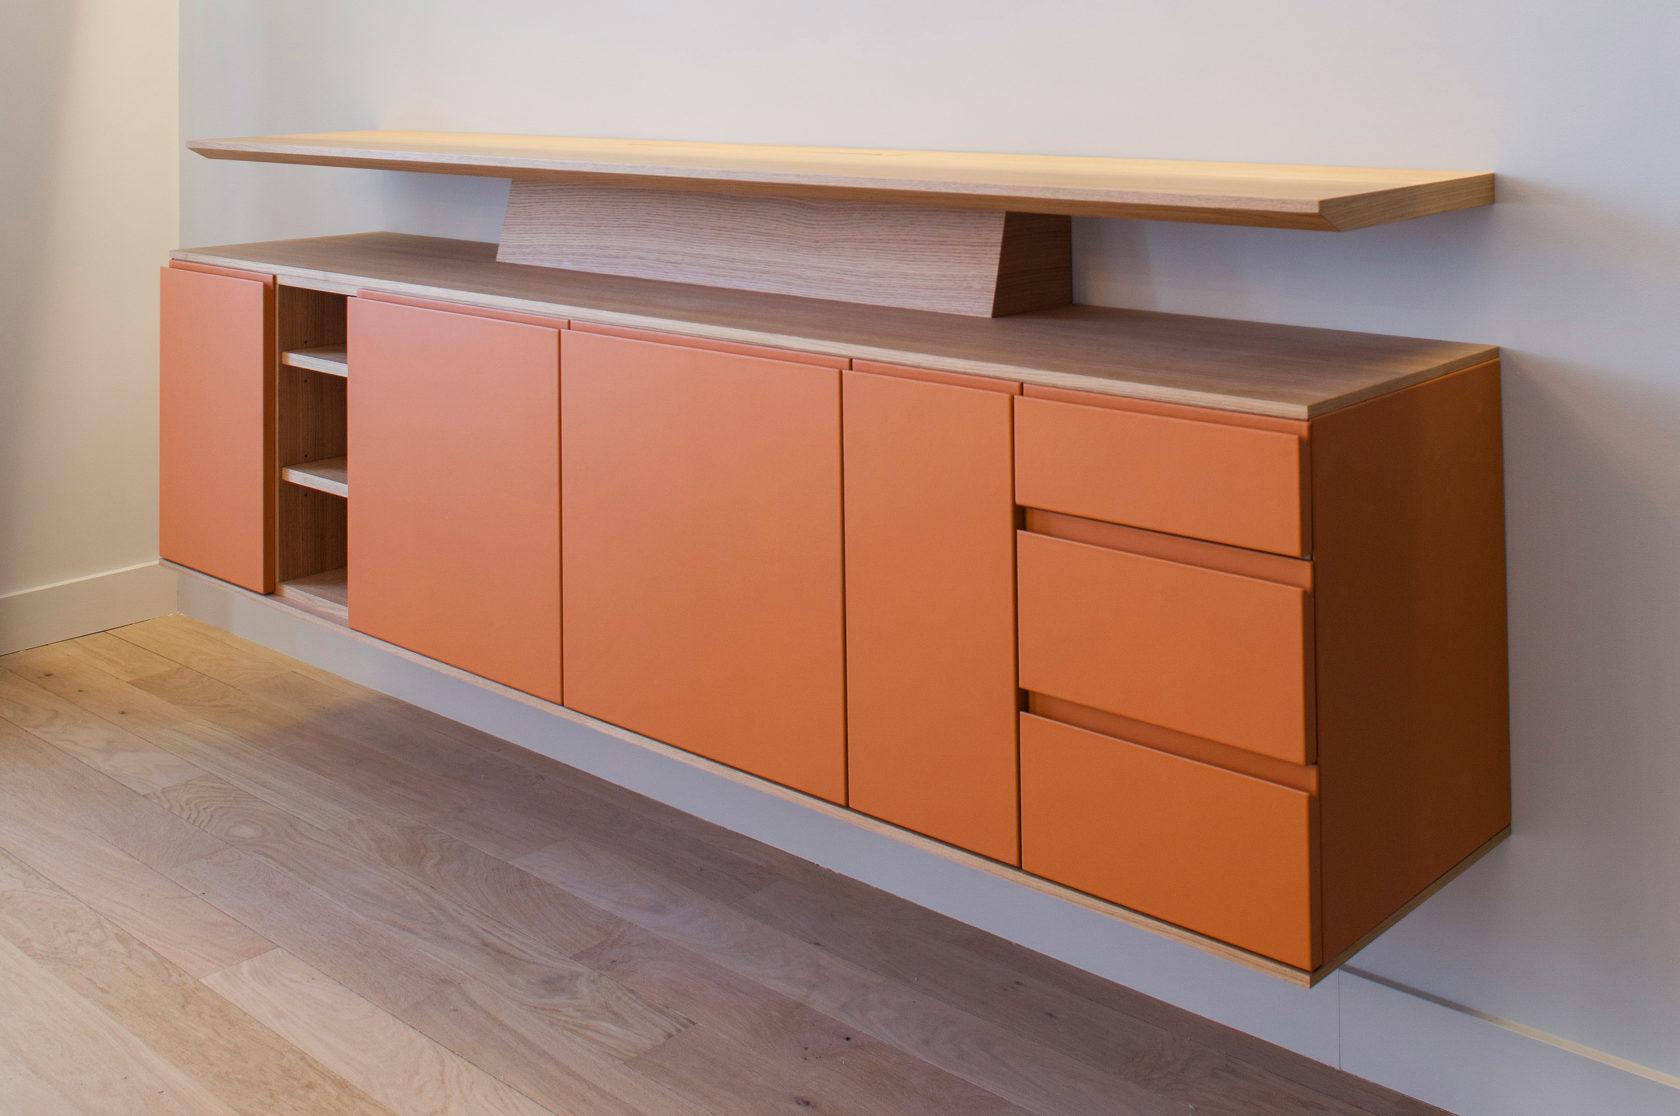 bureau ludovic avenel b niste cr ateur paris. Black Bedroom Furniture Sets. Home Design Ideas